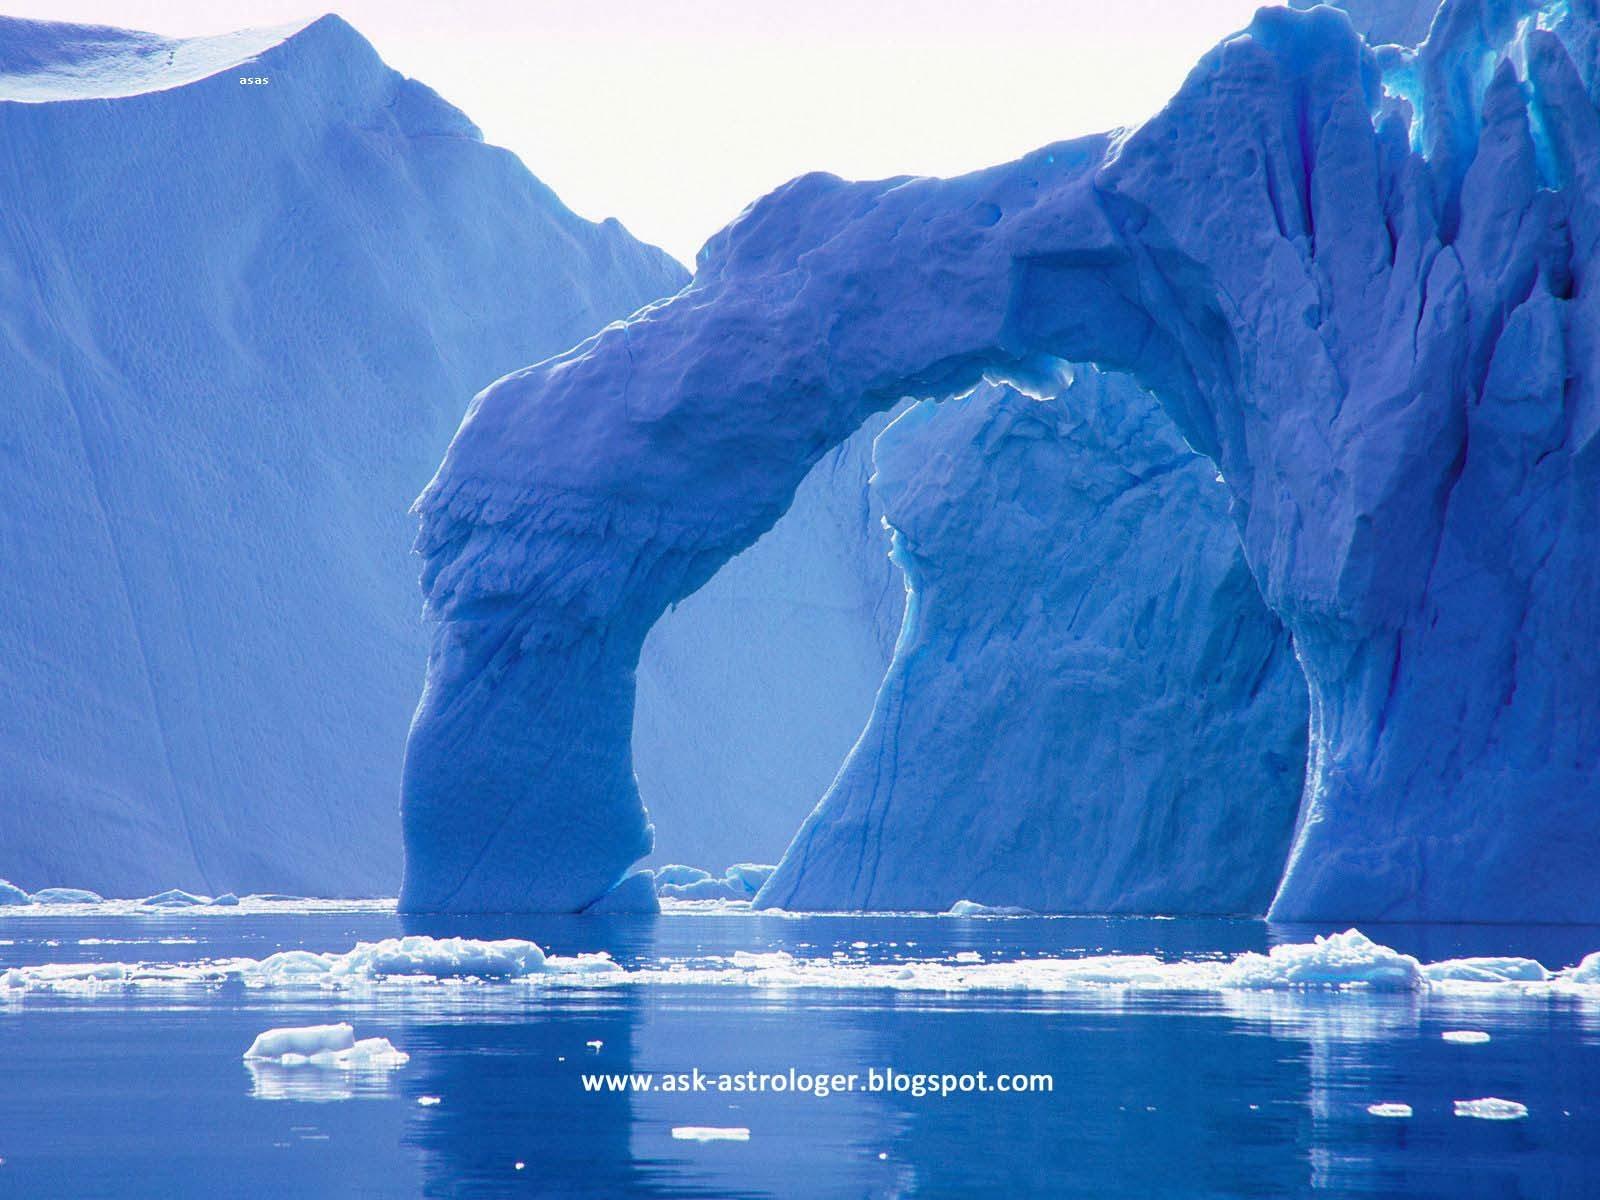 Greenland landmass